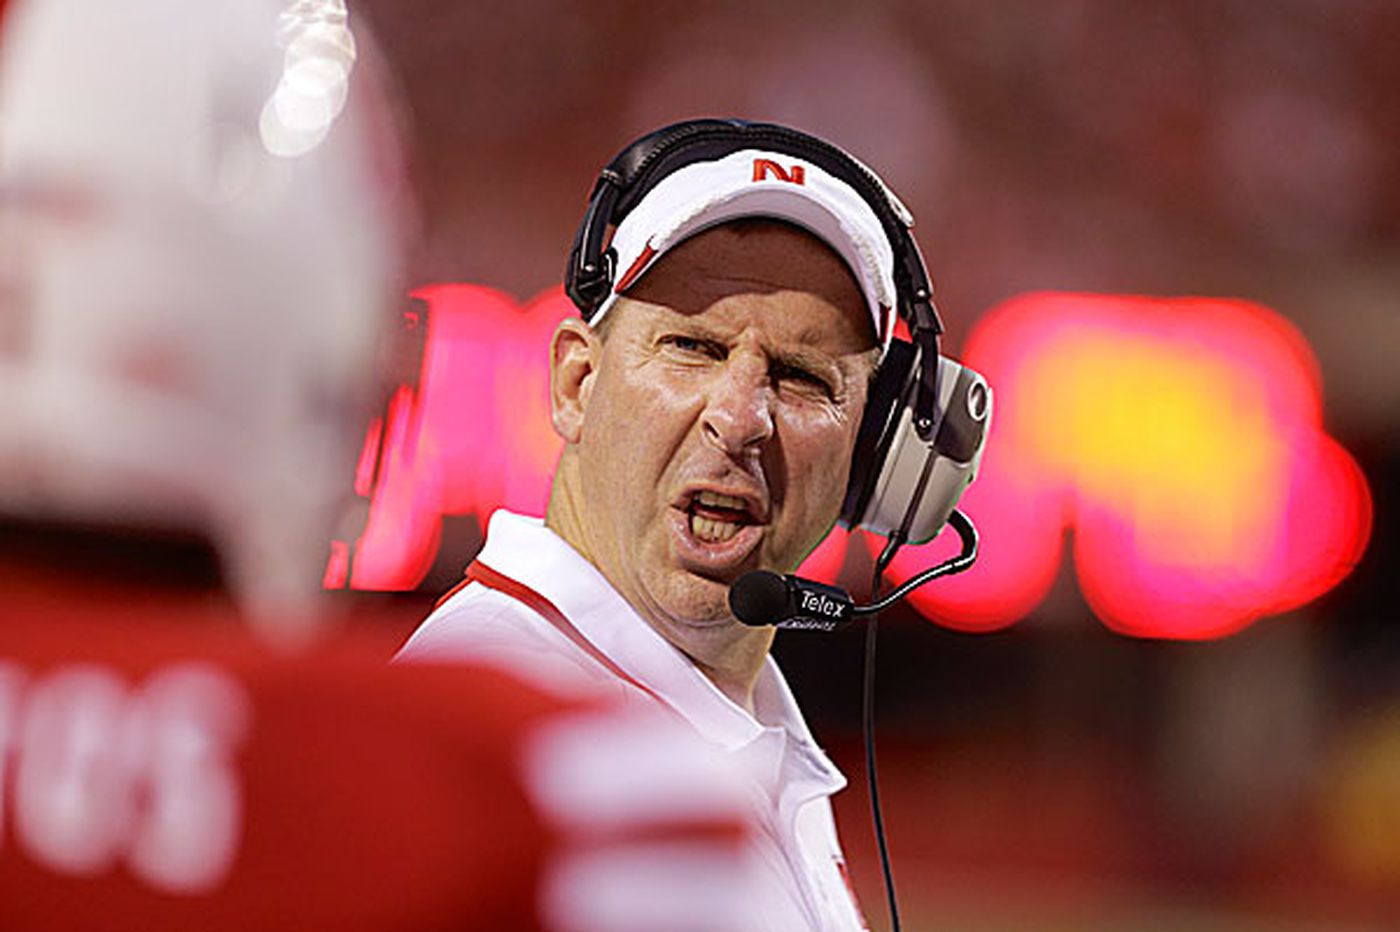 Nebraska's Pelini recalls last visit to Penn State